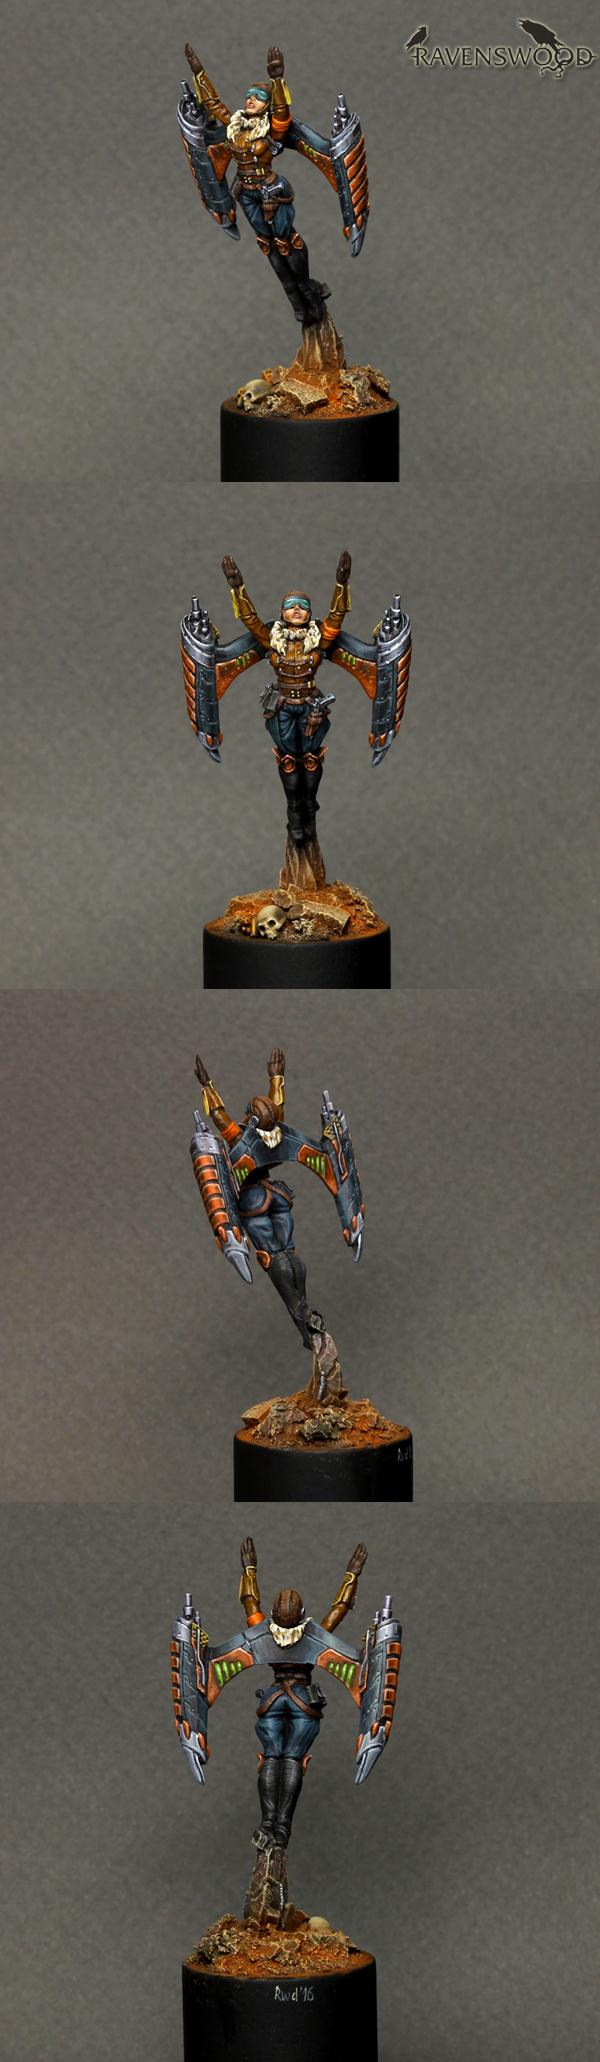 Iron Empire Jet Girl